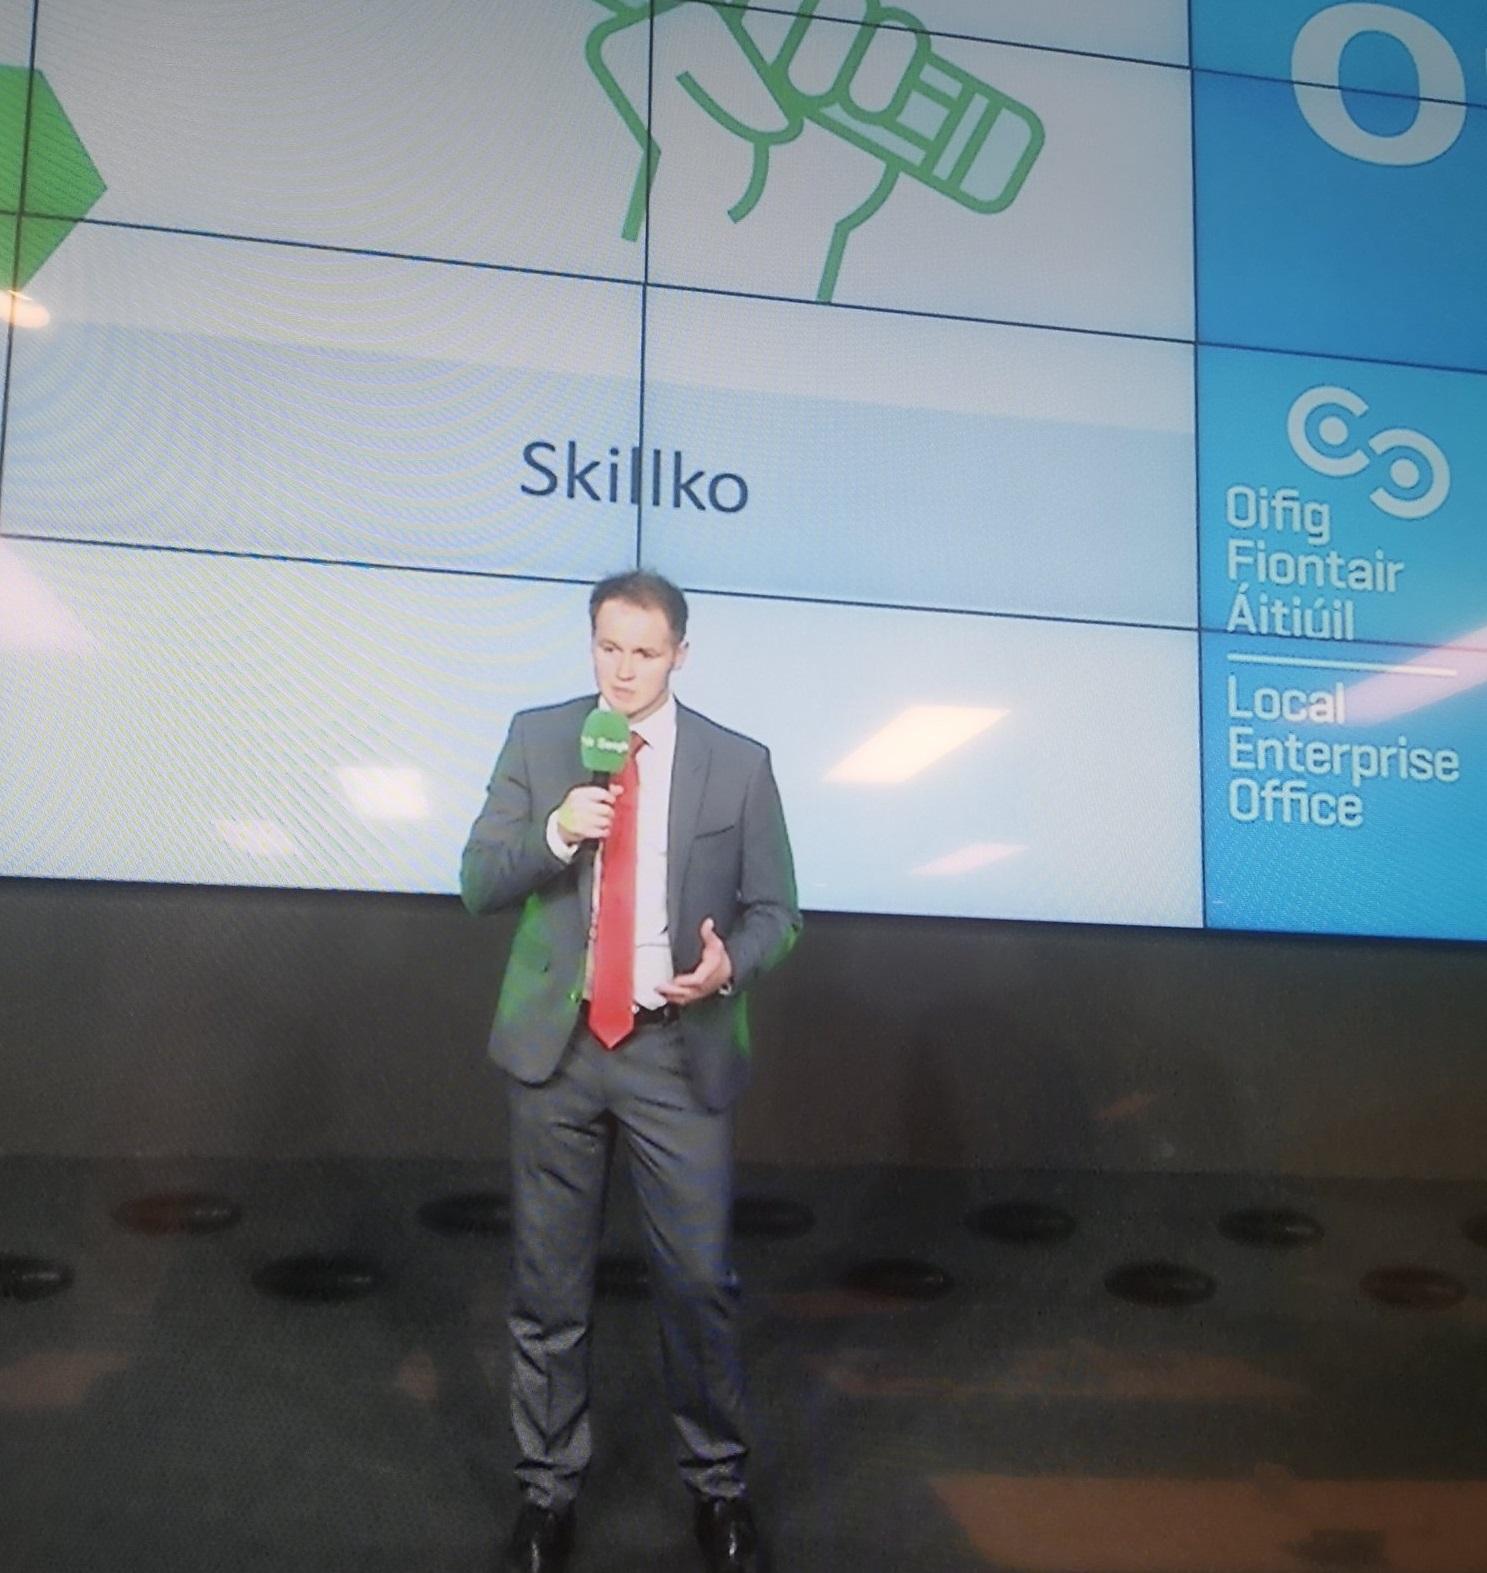 MAYO - Brendan Maloney, Skillko - Runner Up in Best Business Startup